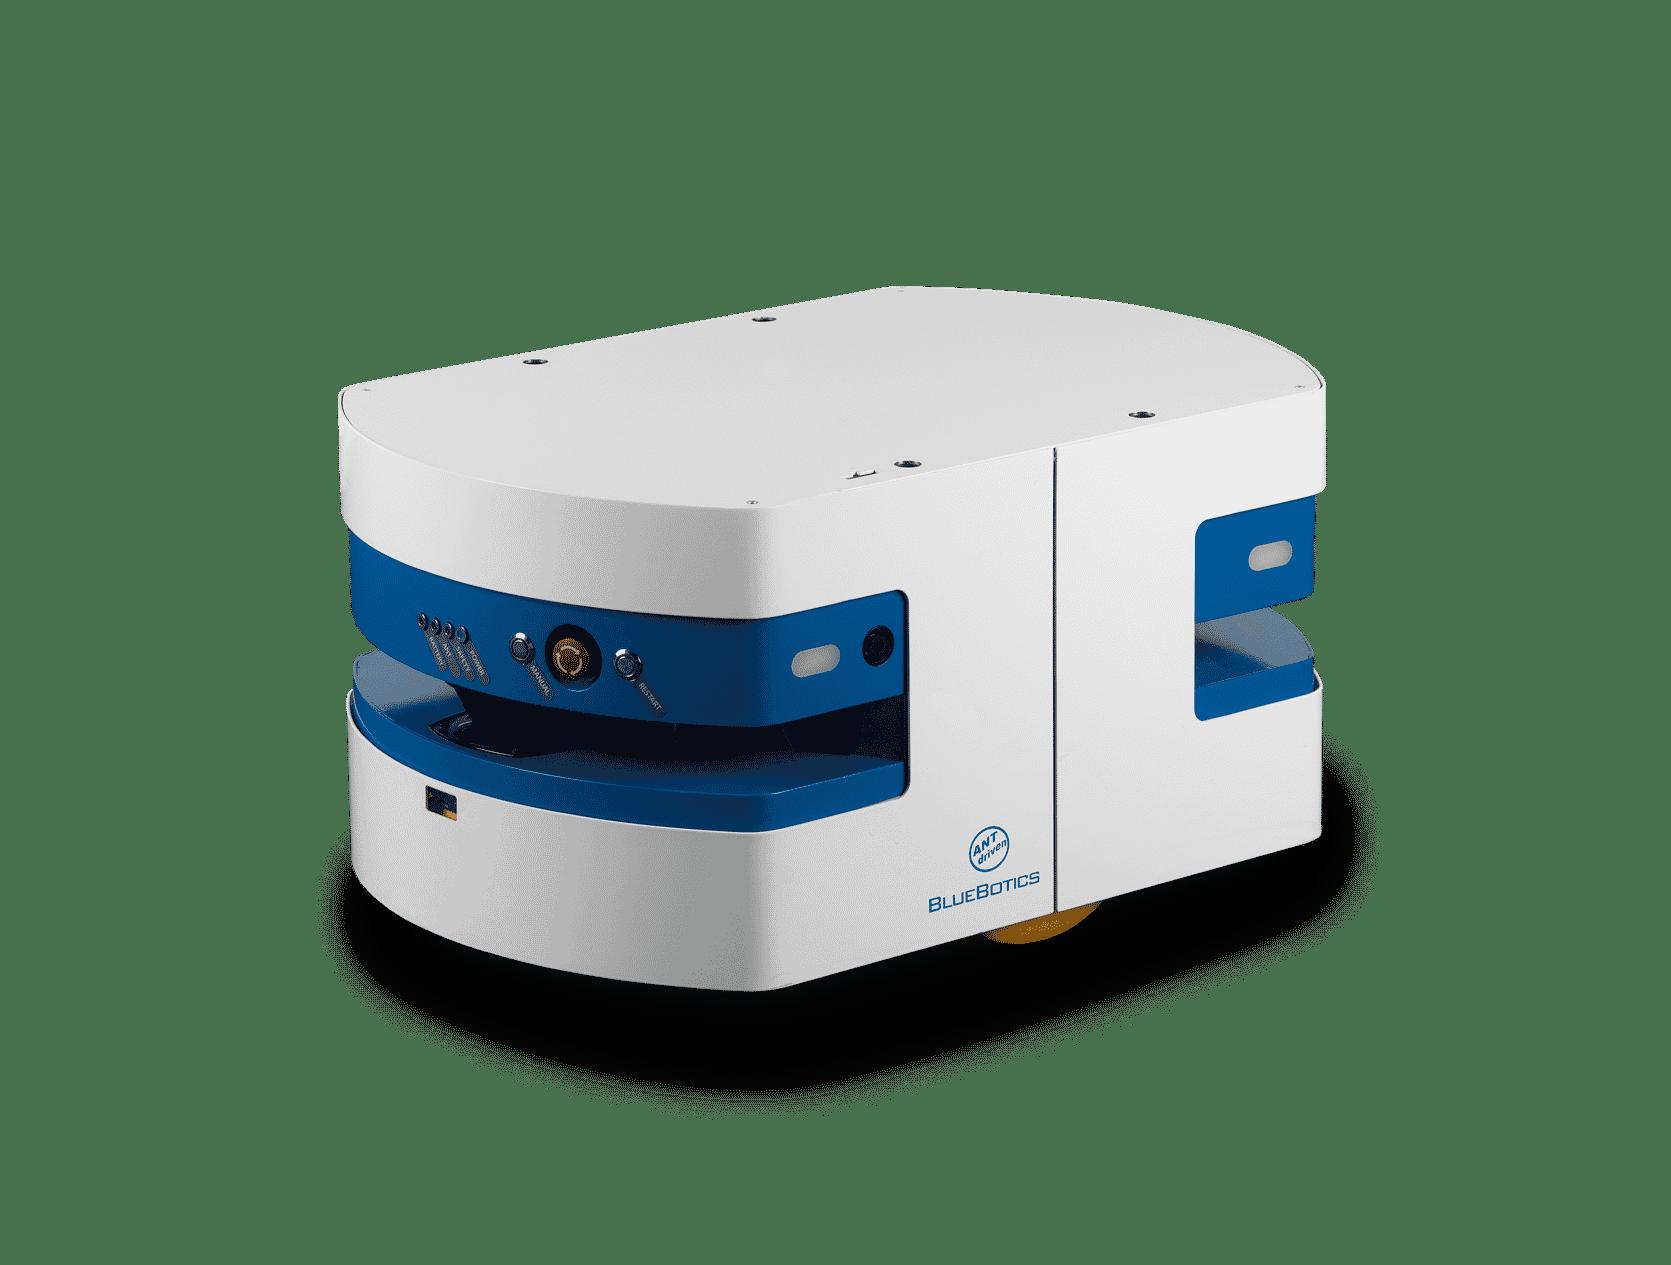 BlueBotics mini - mobile Roboterplattform für Reinräume